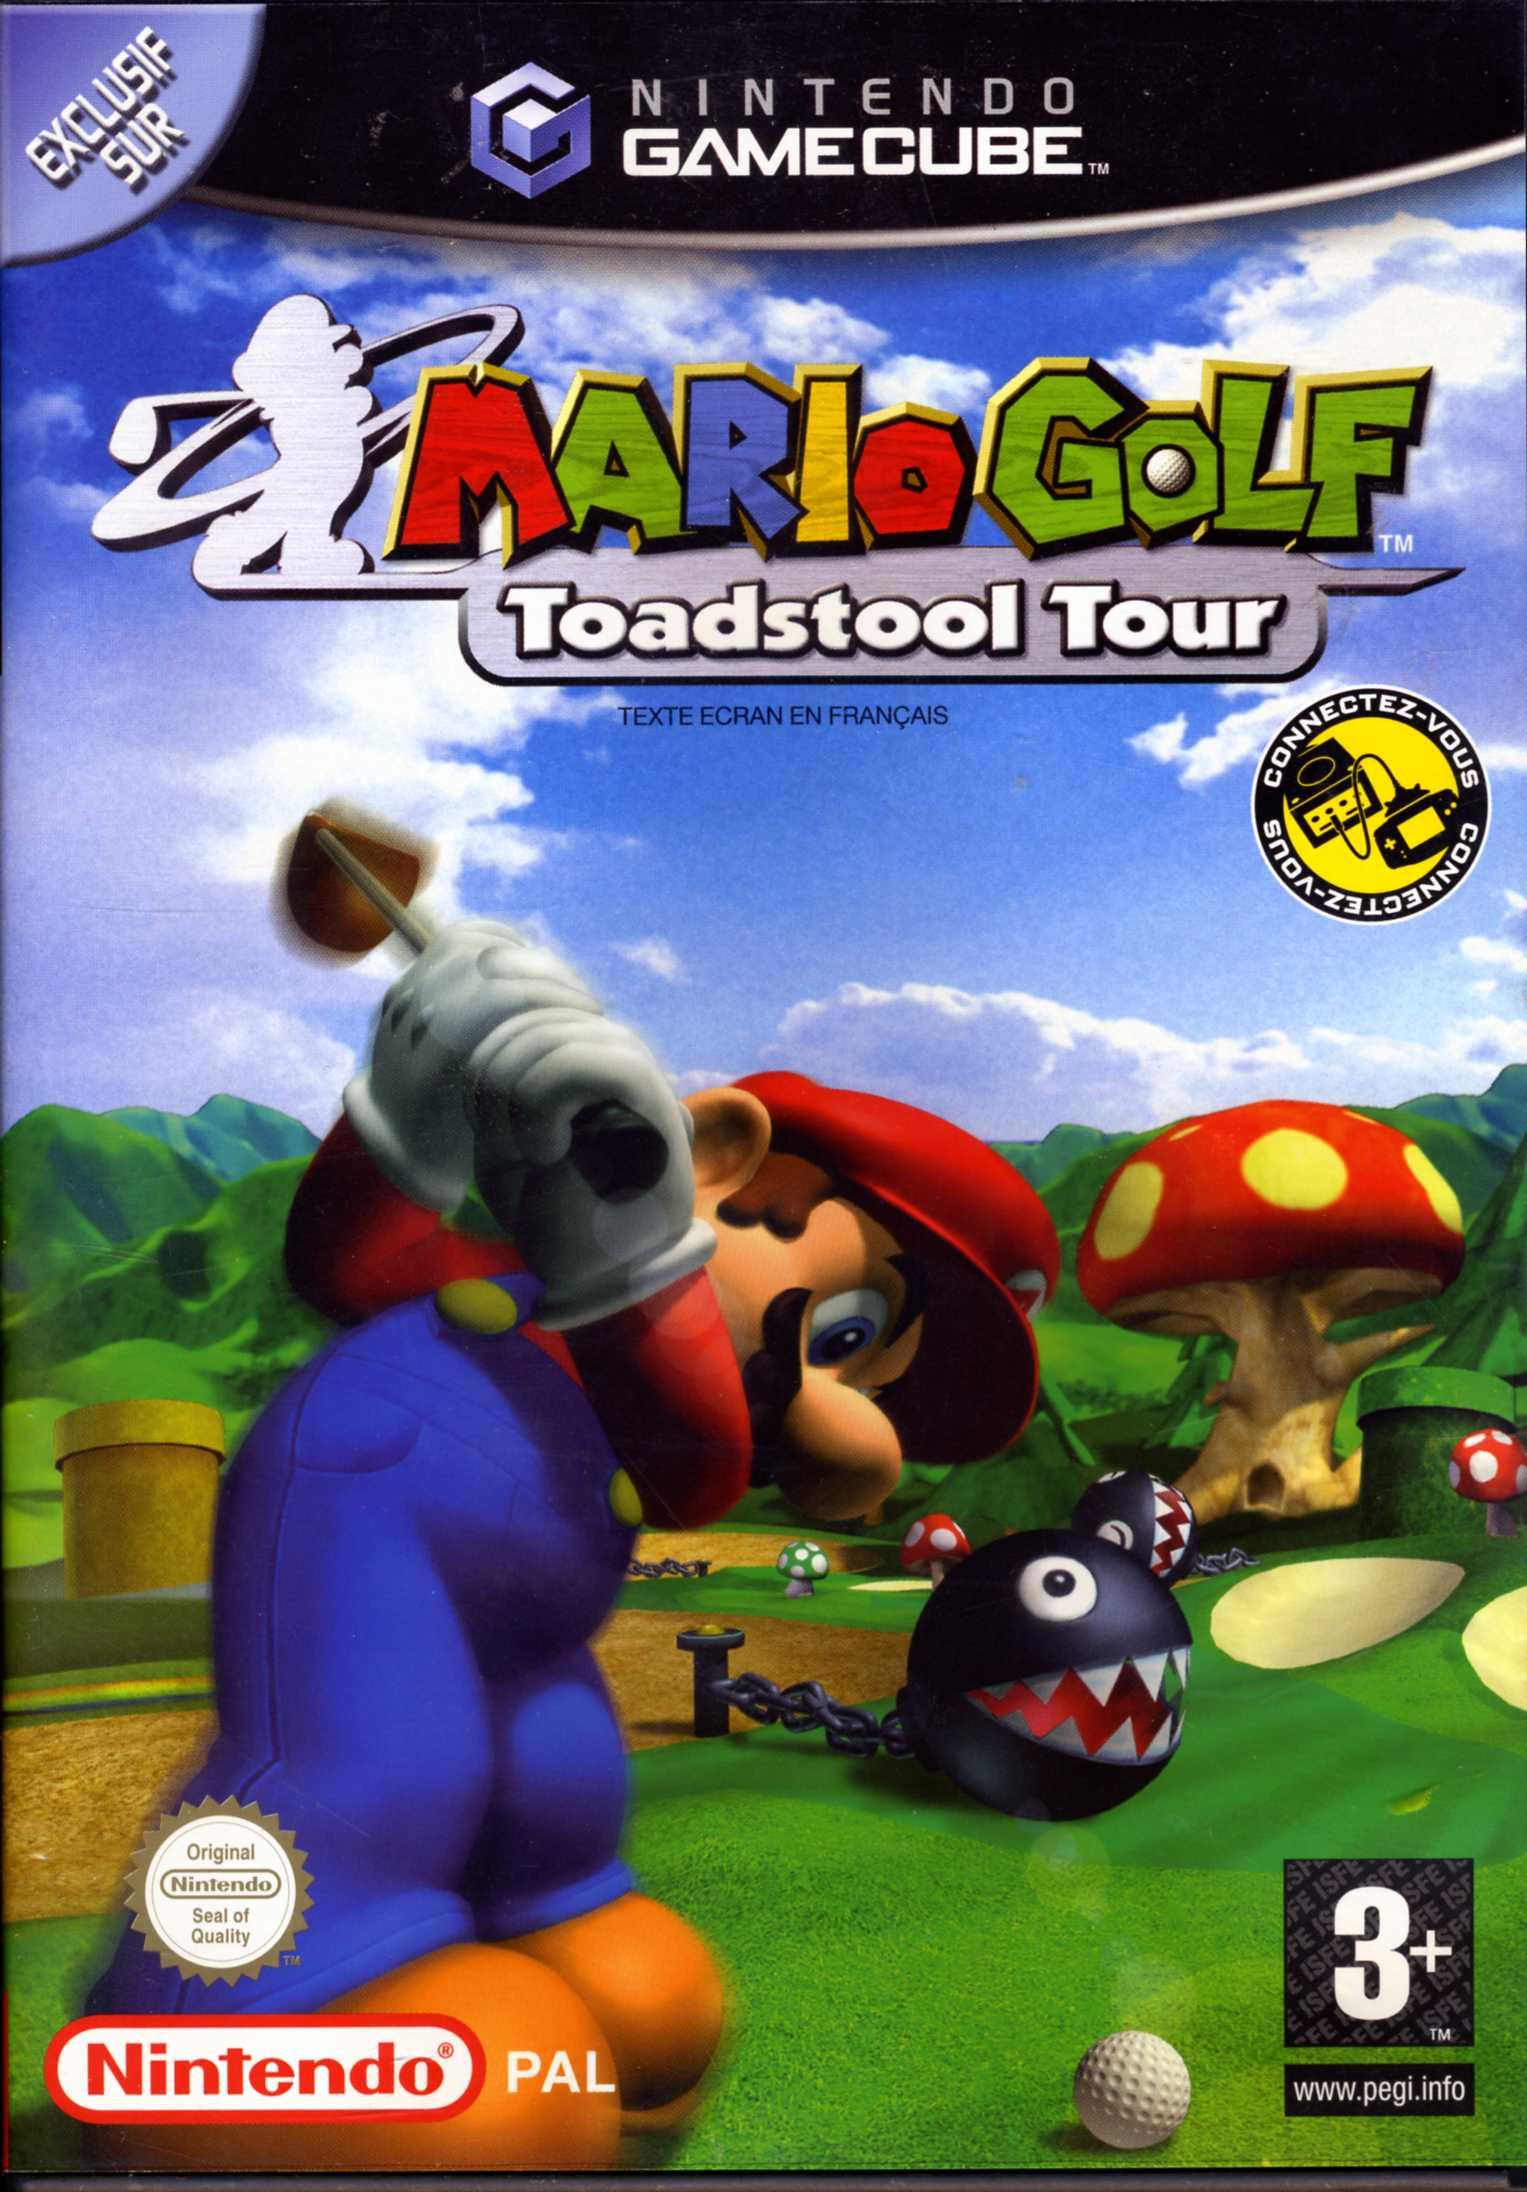 Jeu Video Mario Golf Toadstool Tour Sur GameCube 0